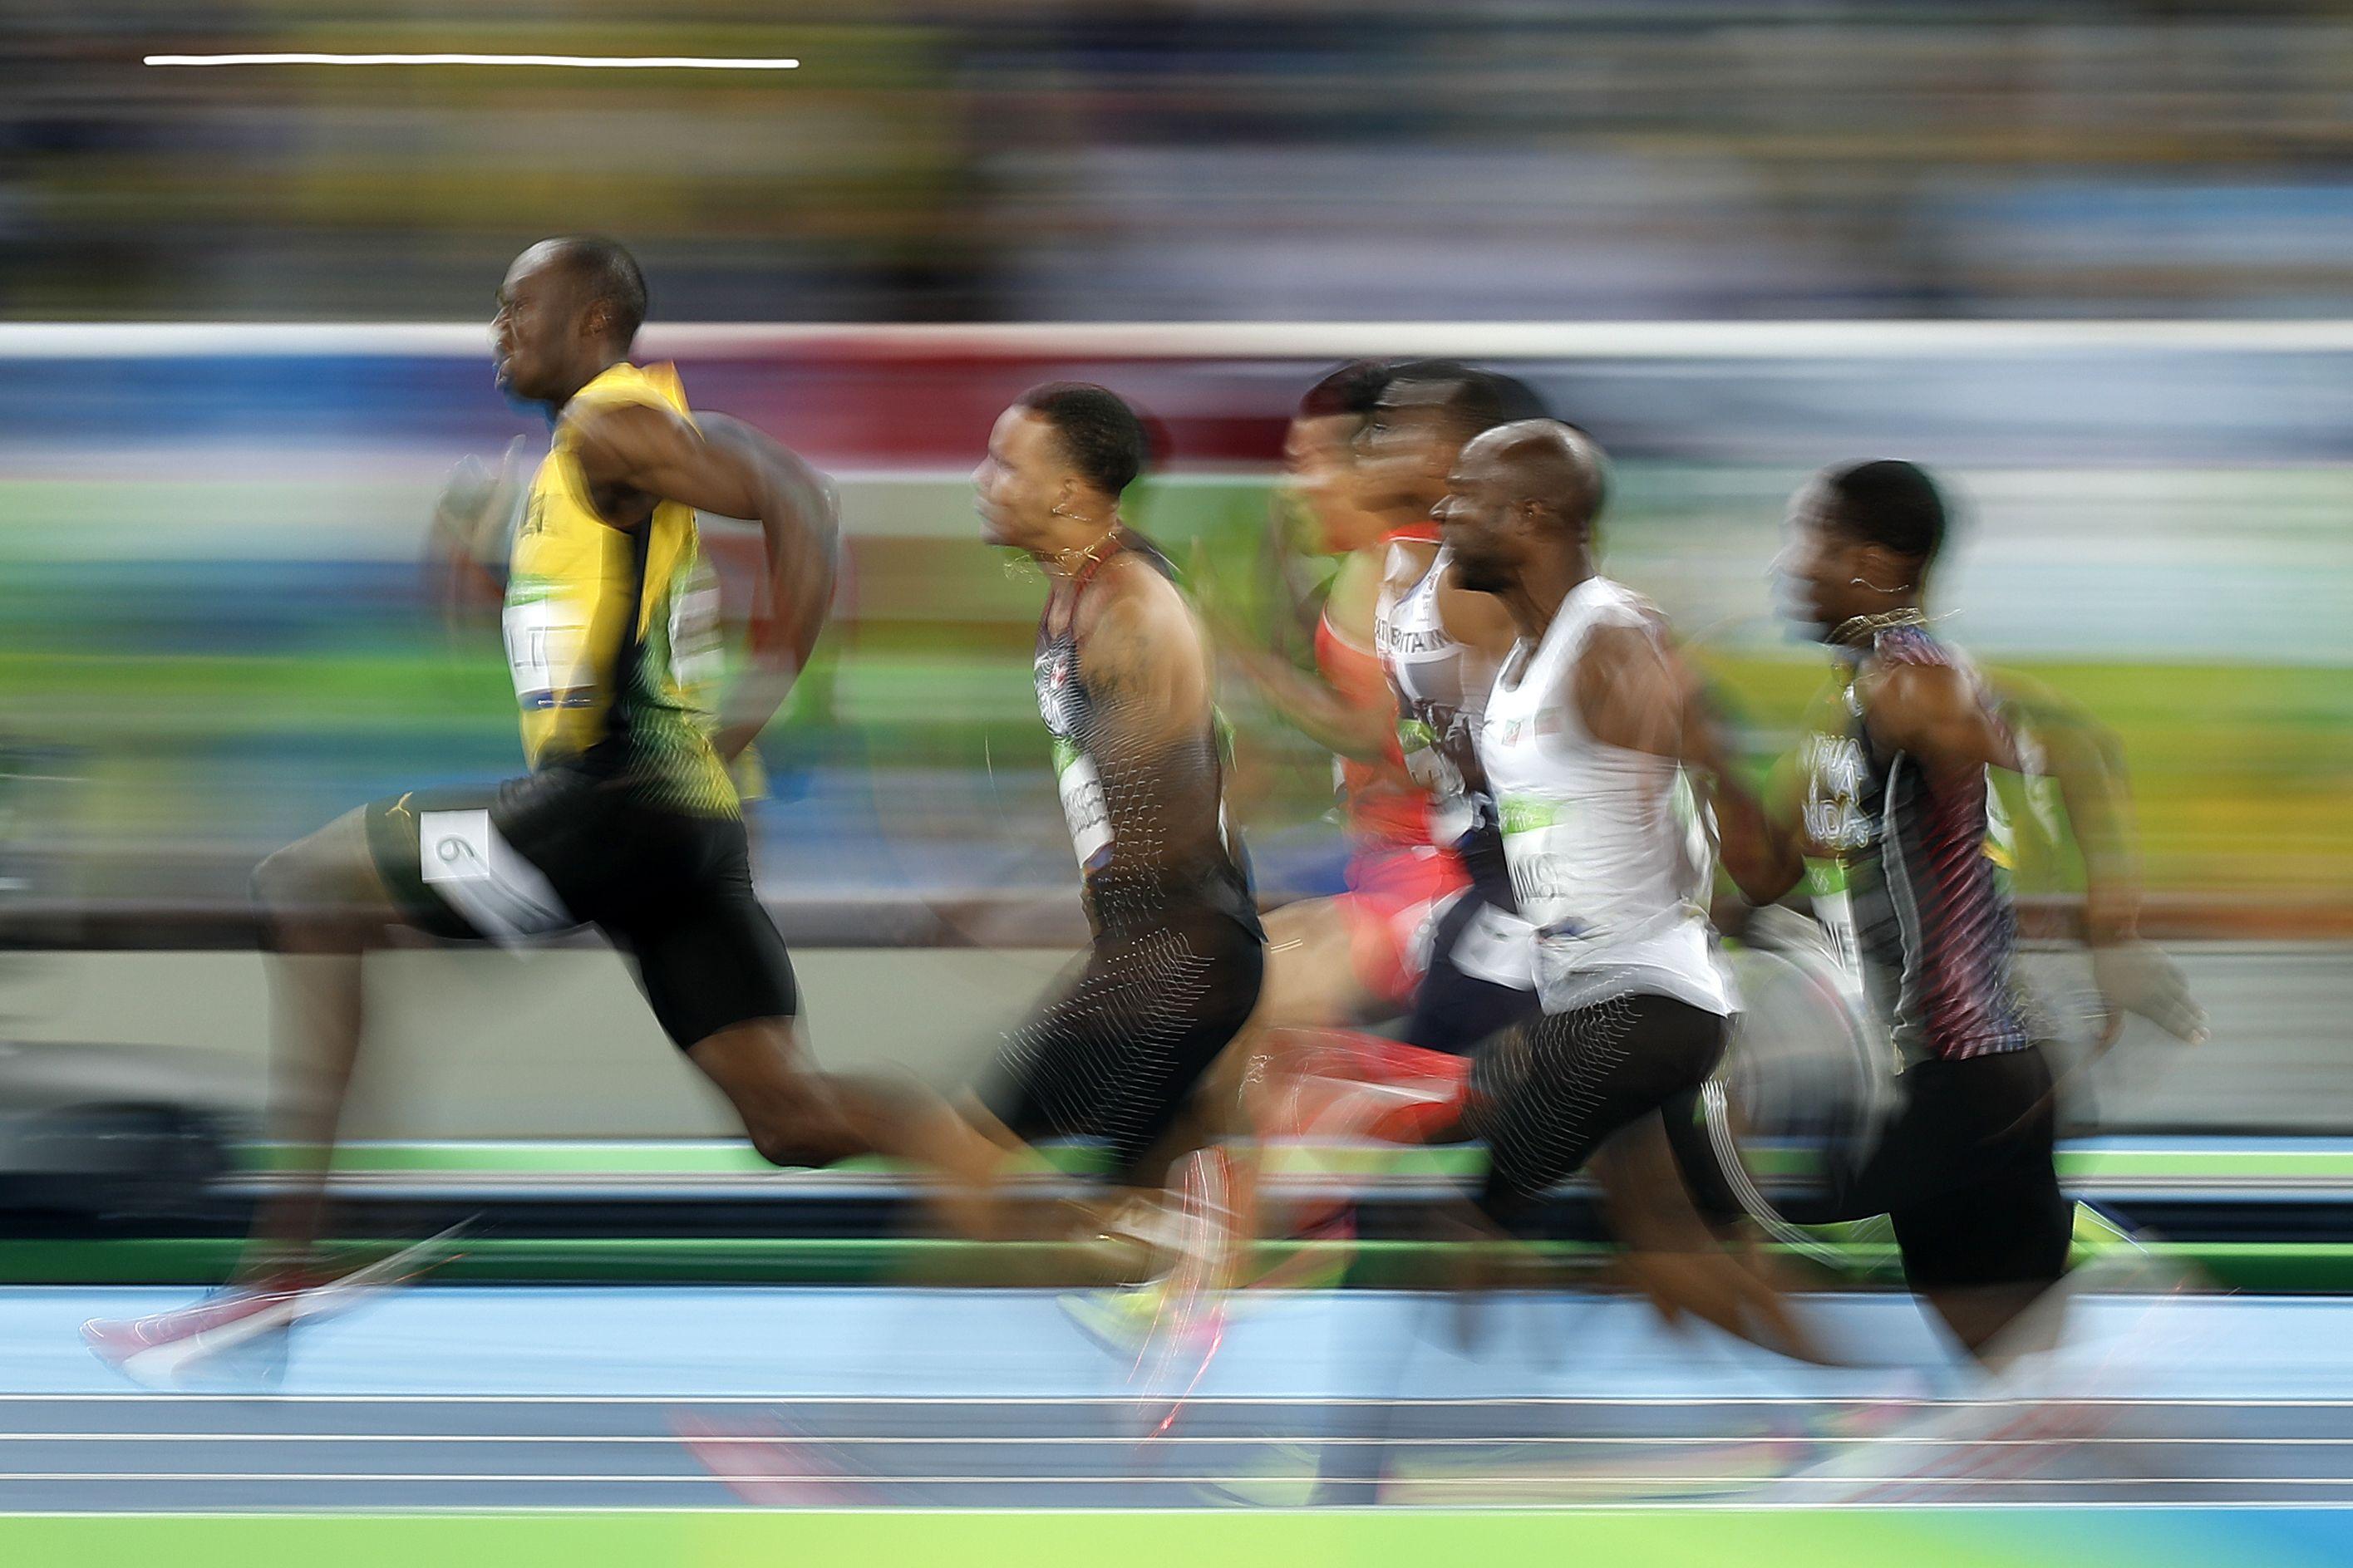 Olympics: Imperious Bolt completes amazing 100m treble